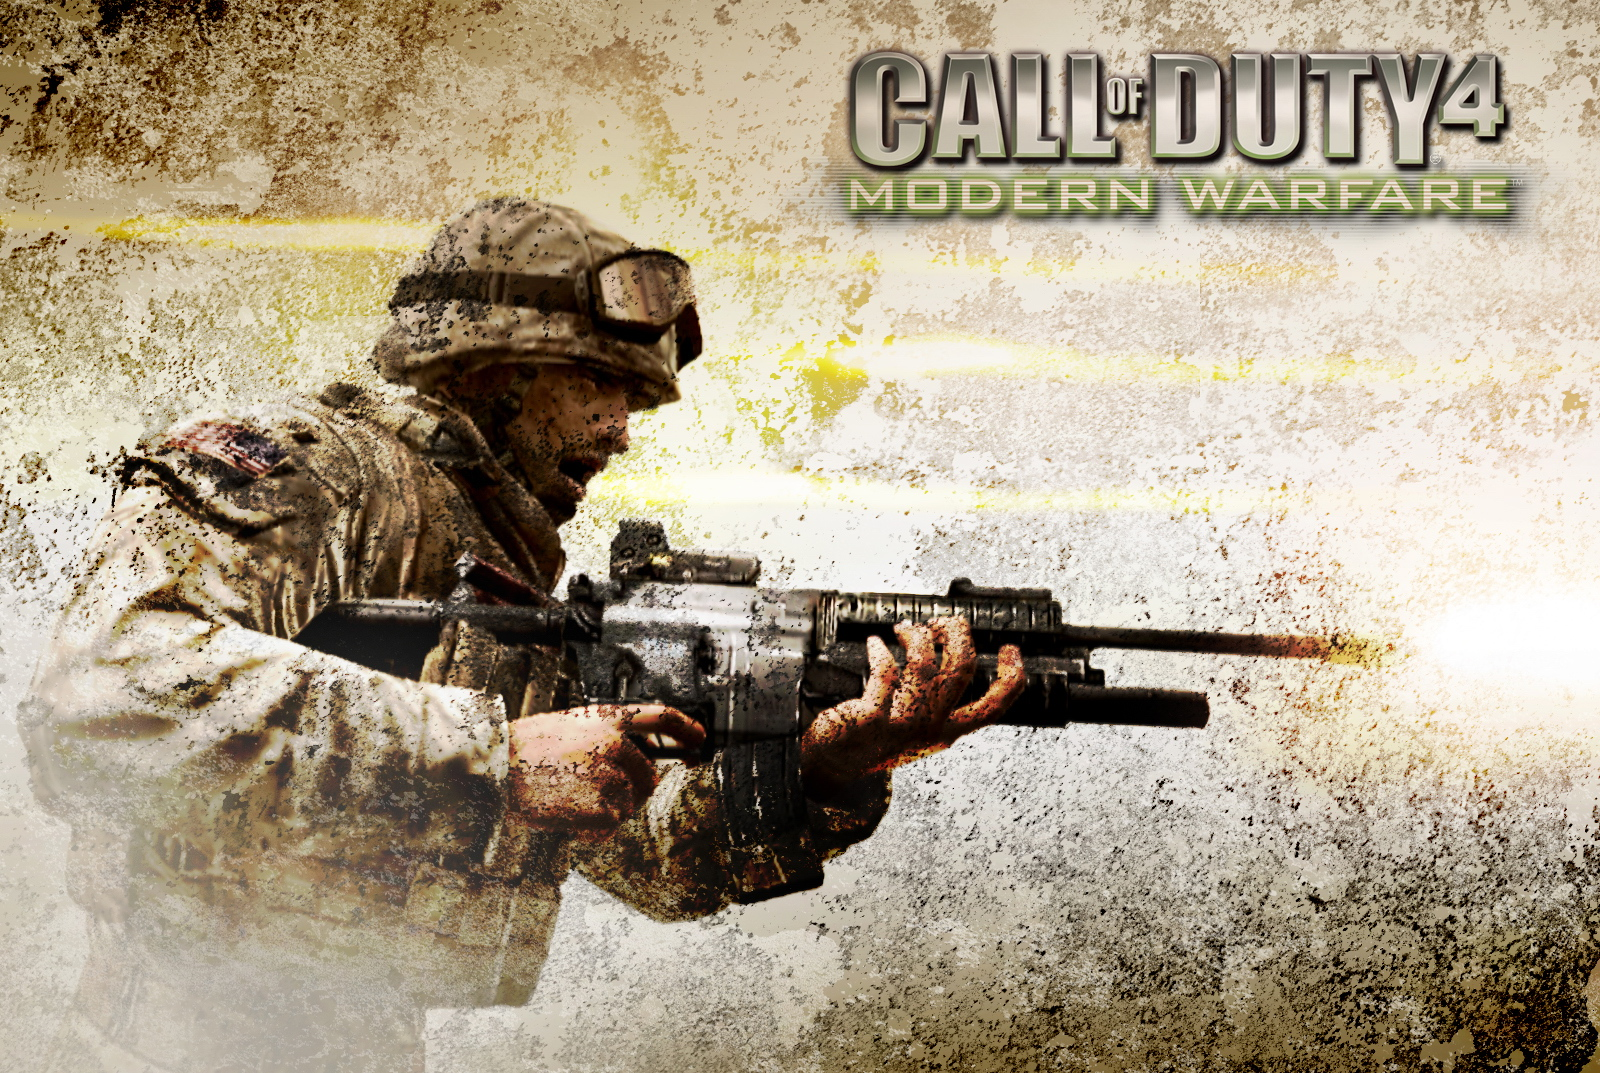 Арт к игре Call of Duty 4: Modern Warfare